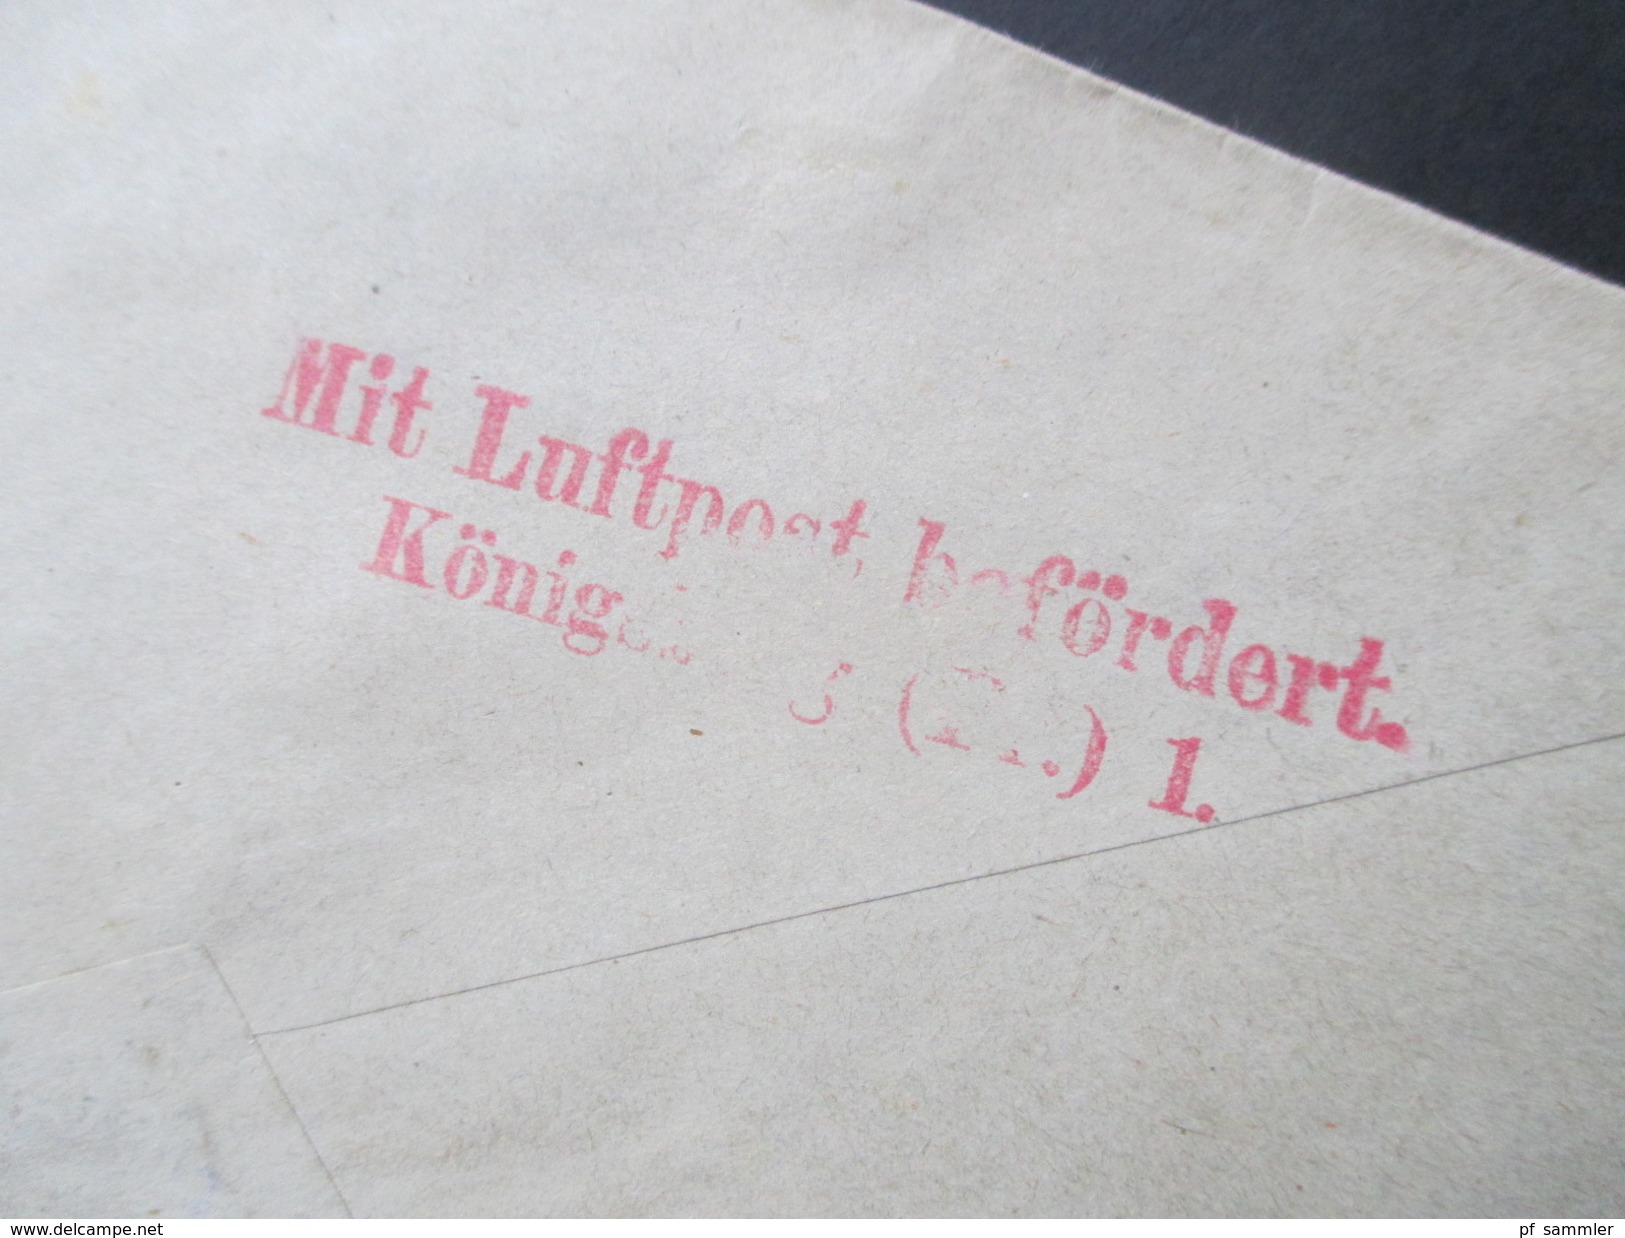 Lettland 1921 Flugpost MiF Nr. 31 Und 76. Rigas Dselsszela St. Latwija. Toller Beleg!! Mit Luftpst Befördert Königsberg - Lettland